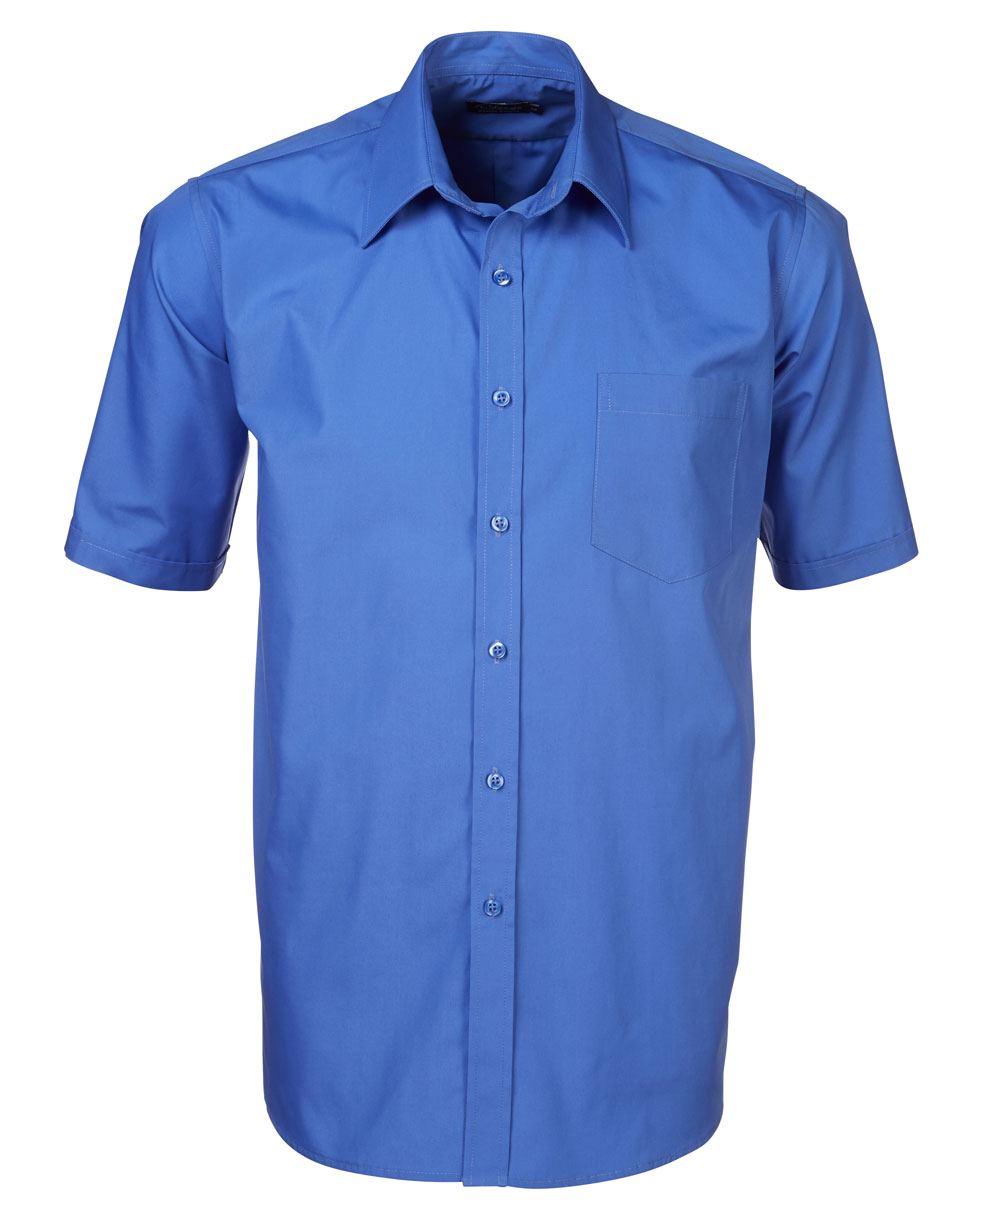 Mens P070 S/s Shirt - Blue